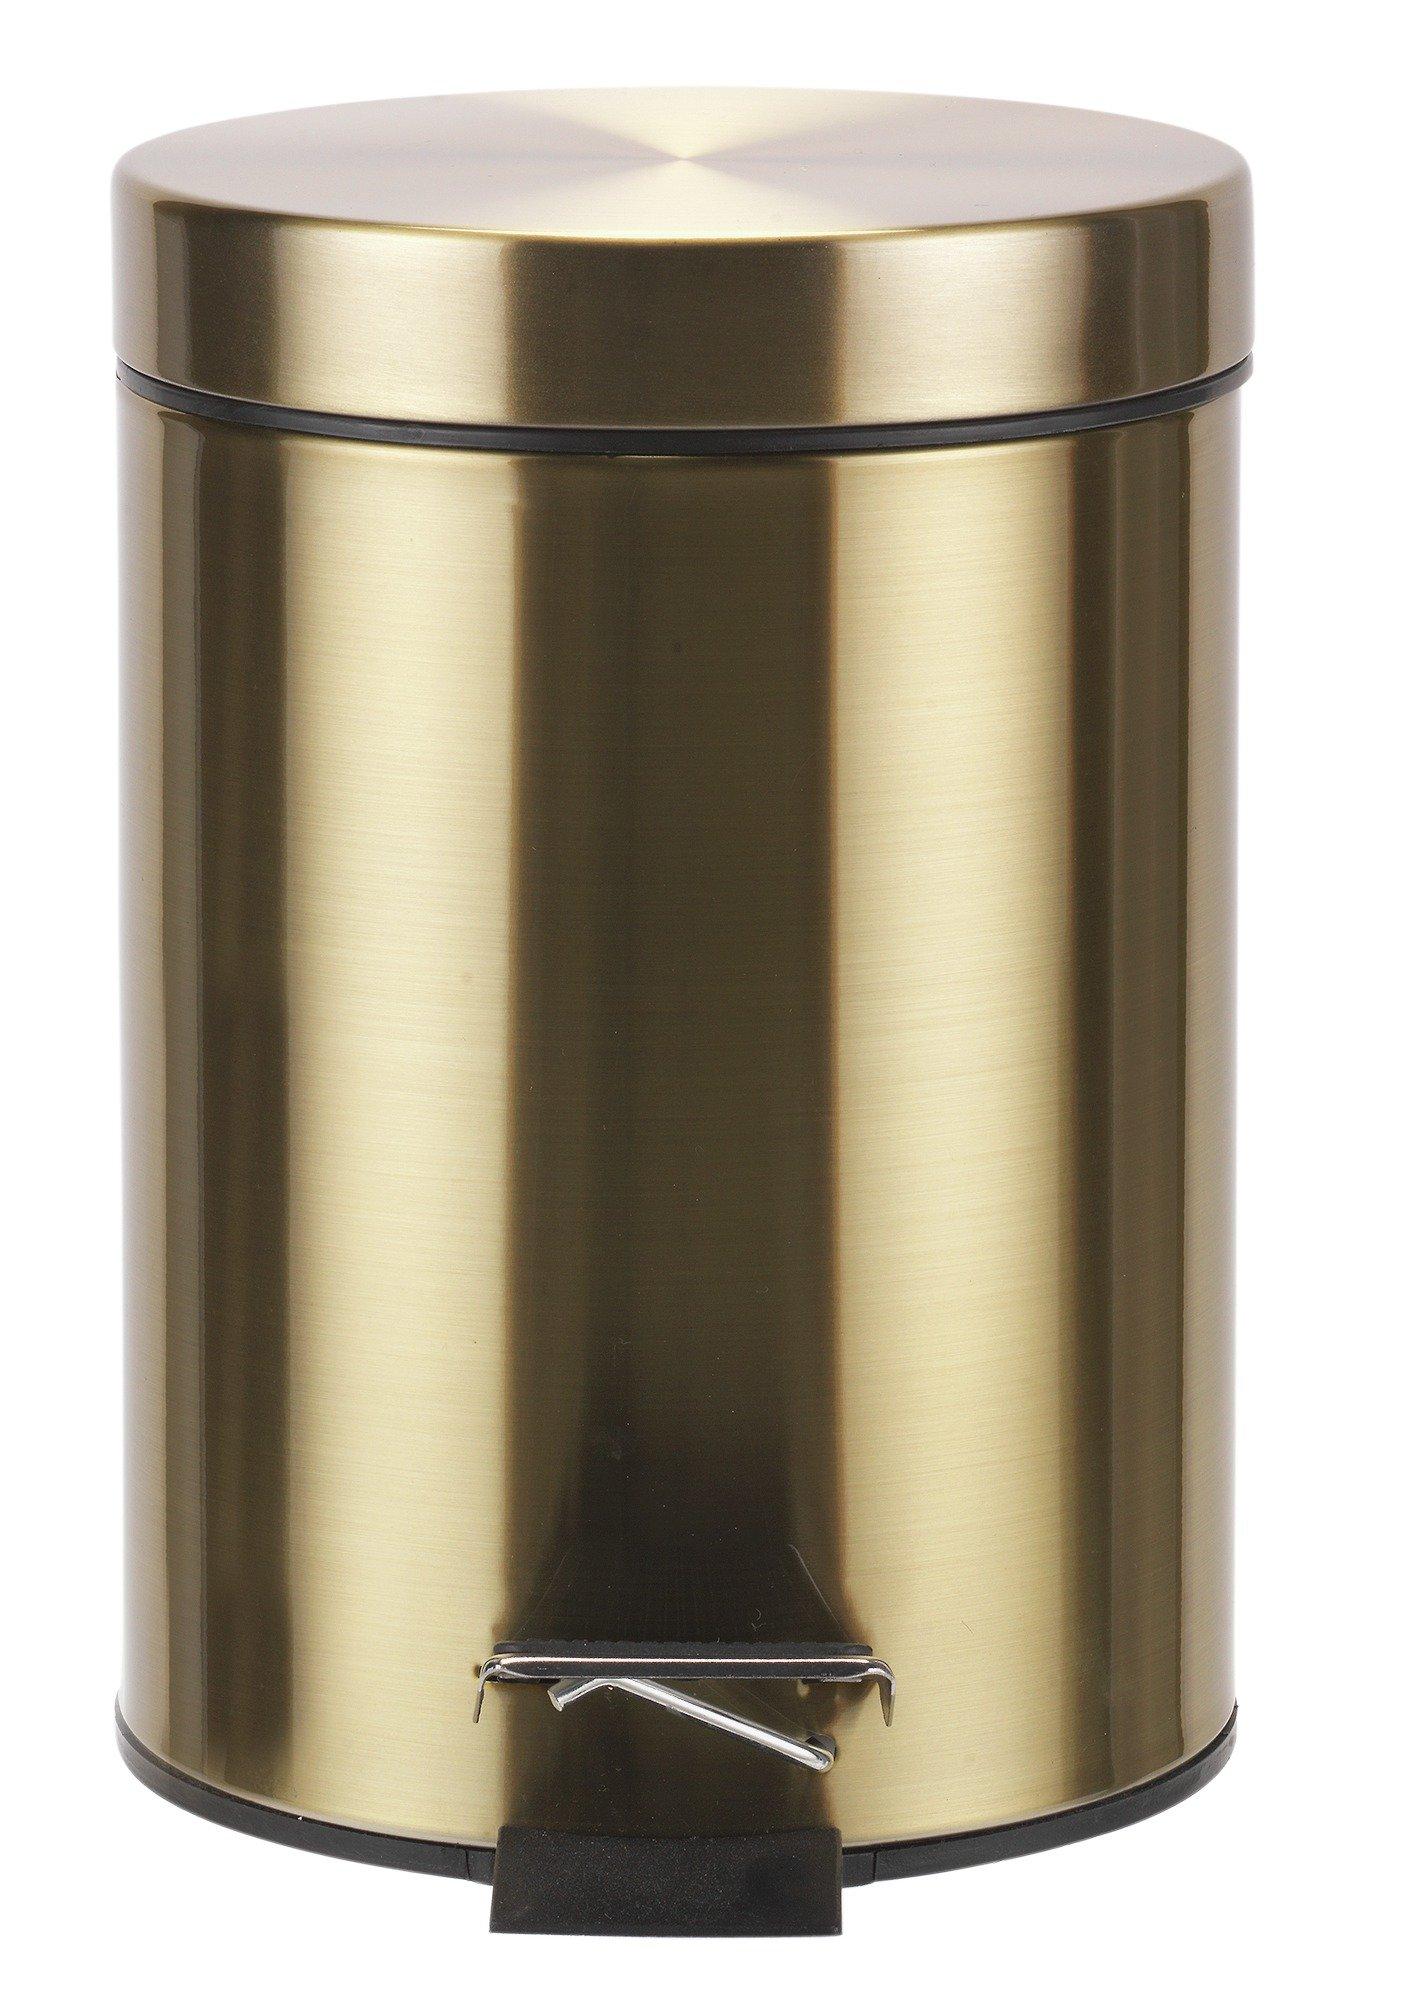 Pedal bins designer homeware for Gold bathroom bin